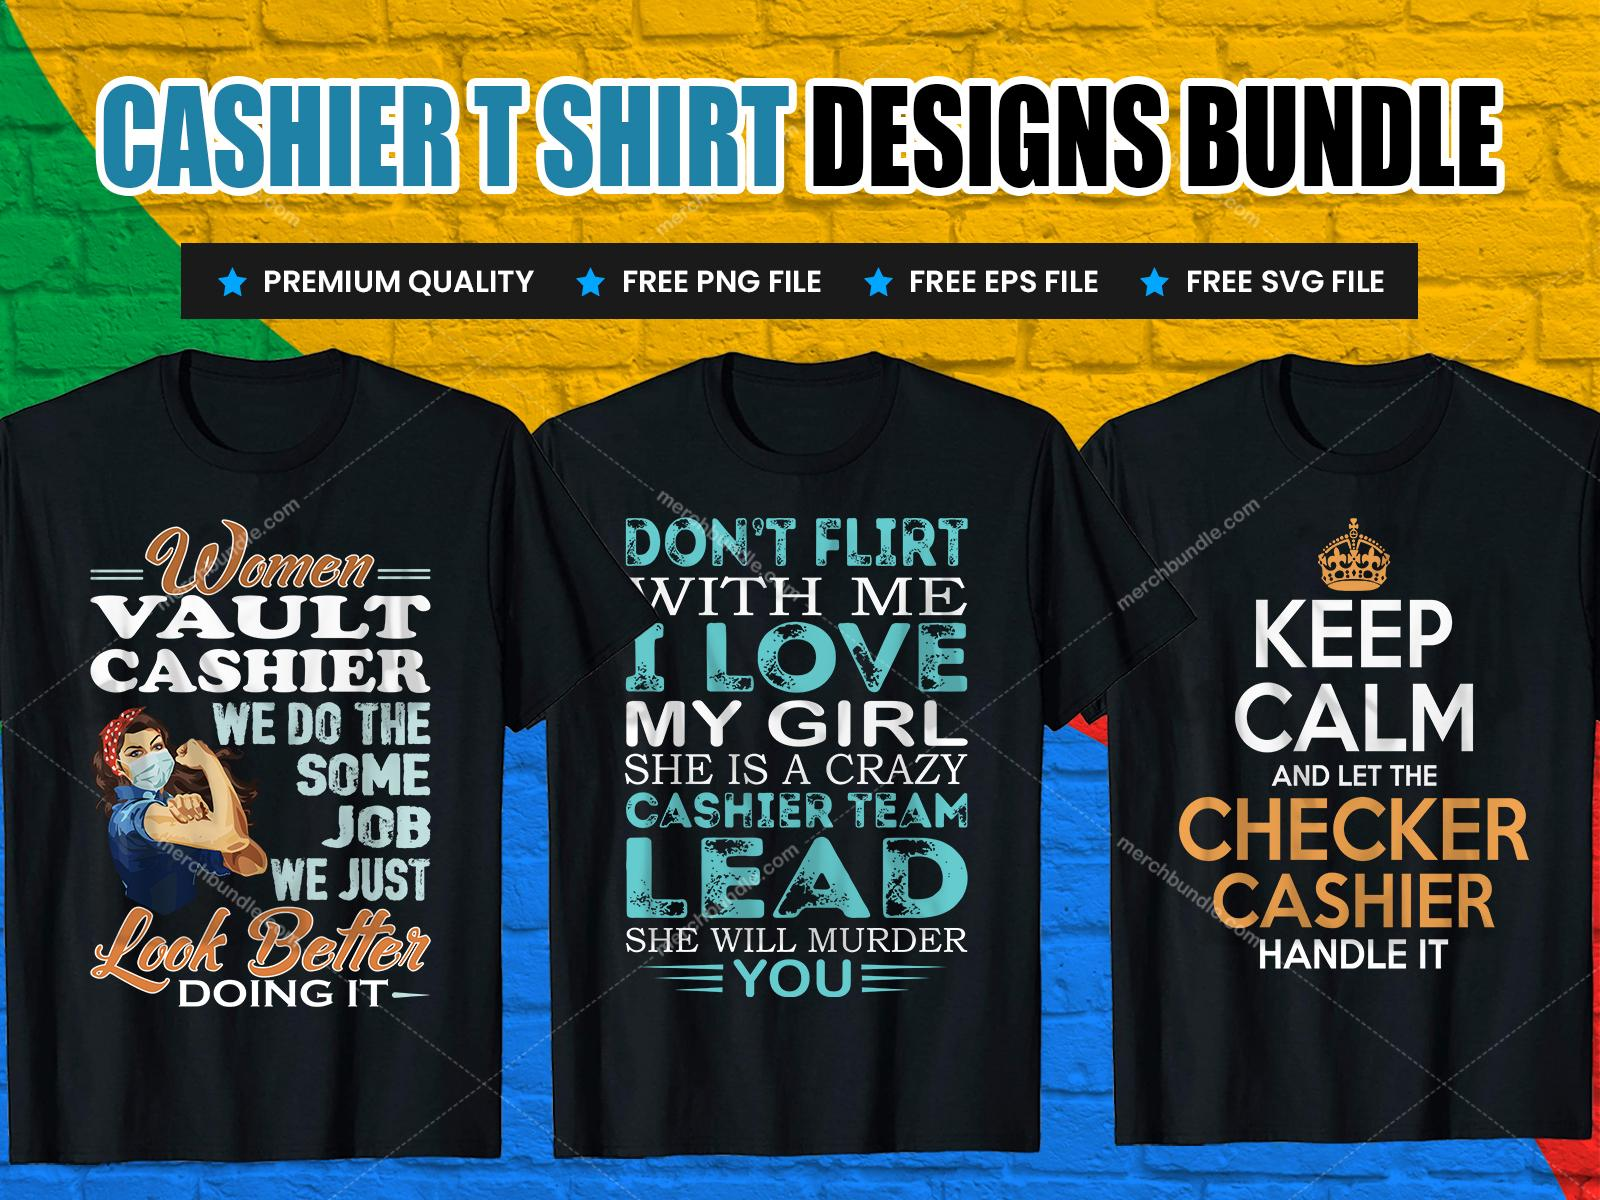 Cashier t shirt